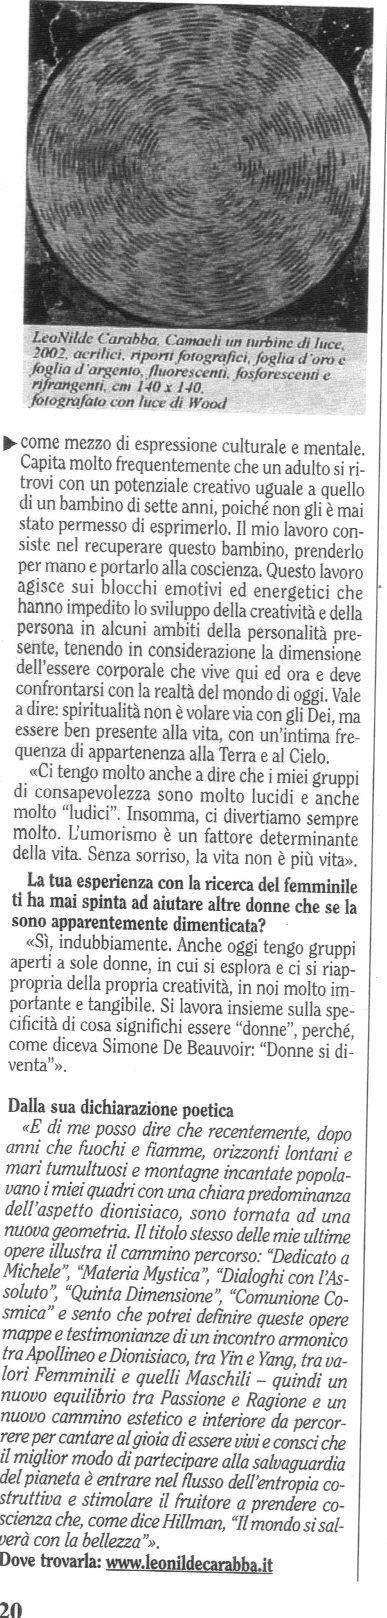 0006_2pag-intervista-sara-verderi_2004